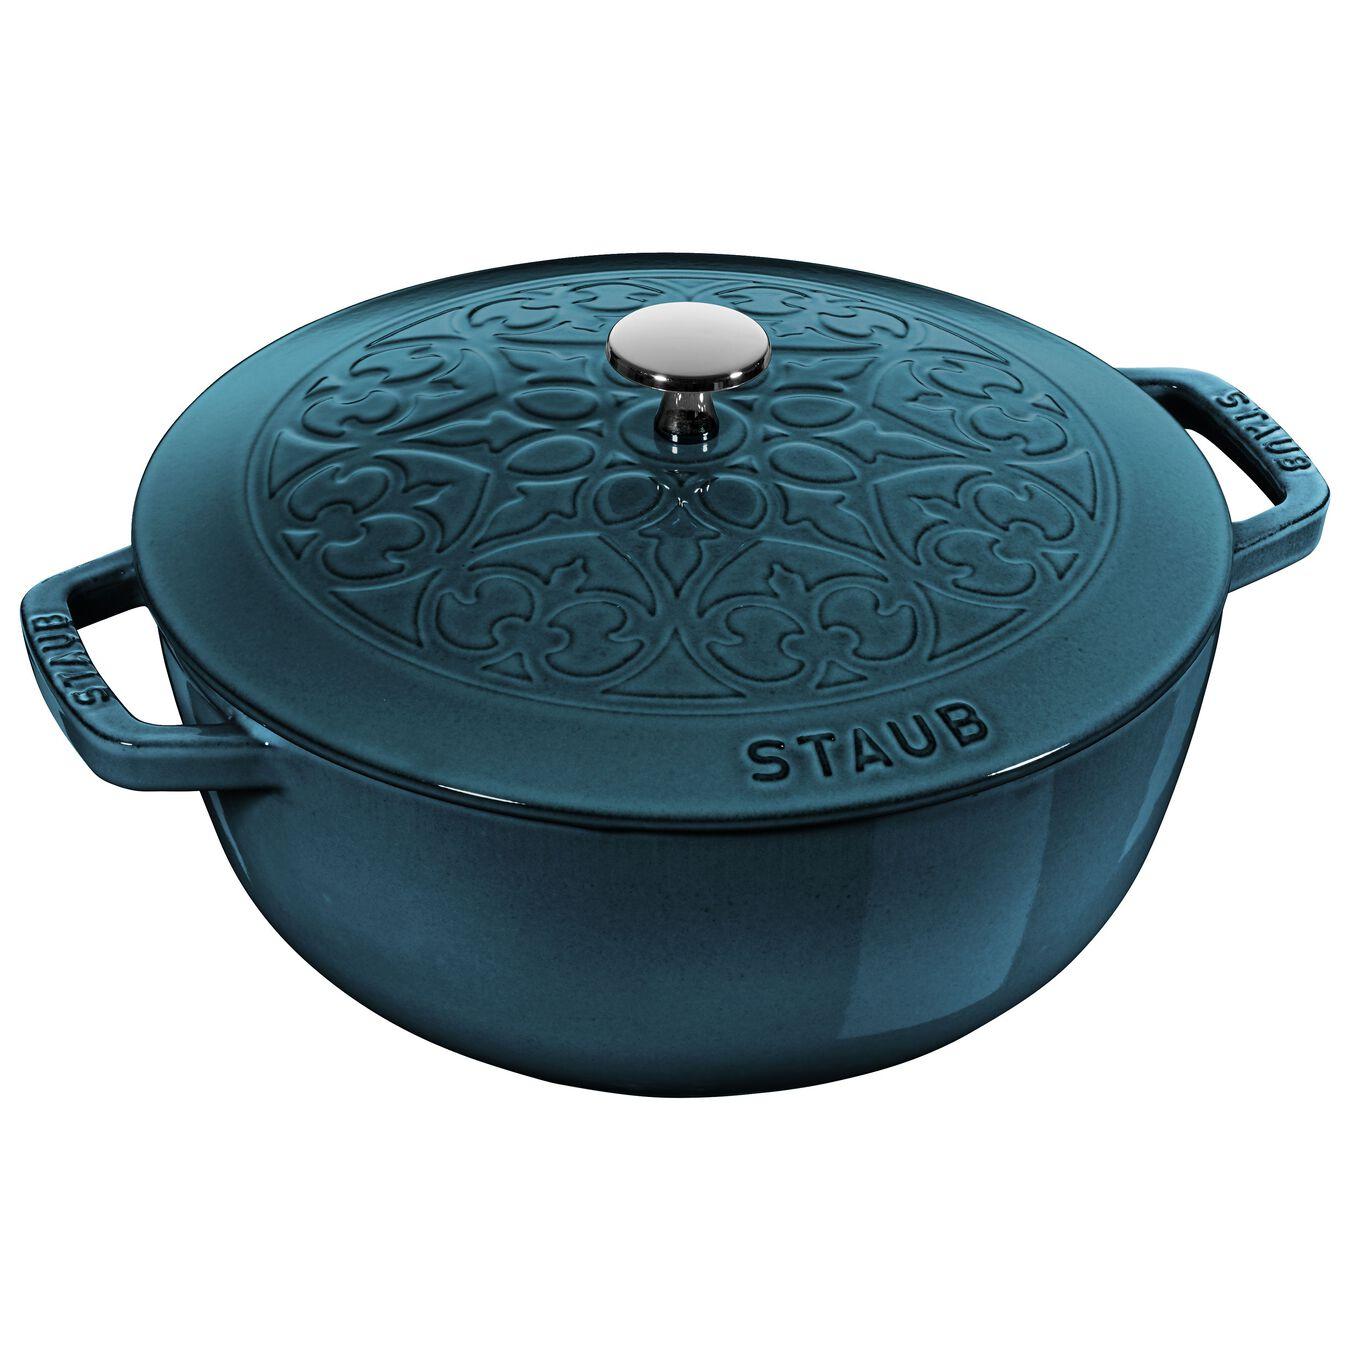 Pot set, lily decal, 2 Piece   round   cast iron   la-mer,,large 2